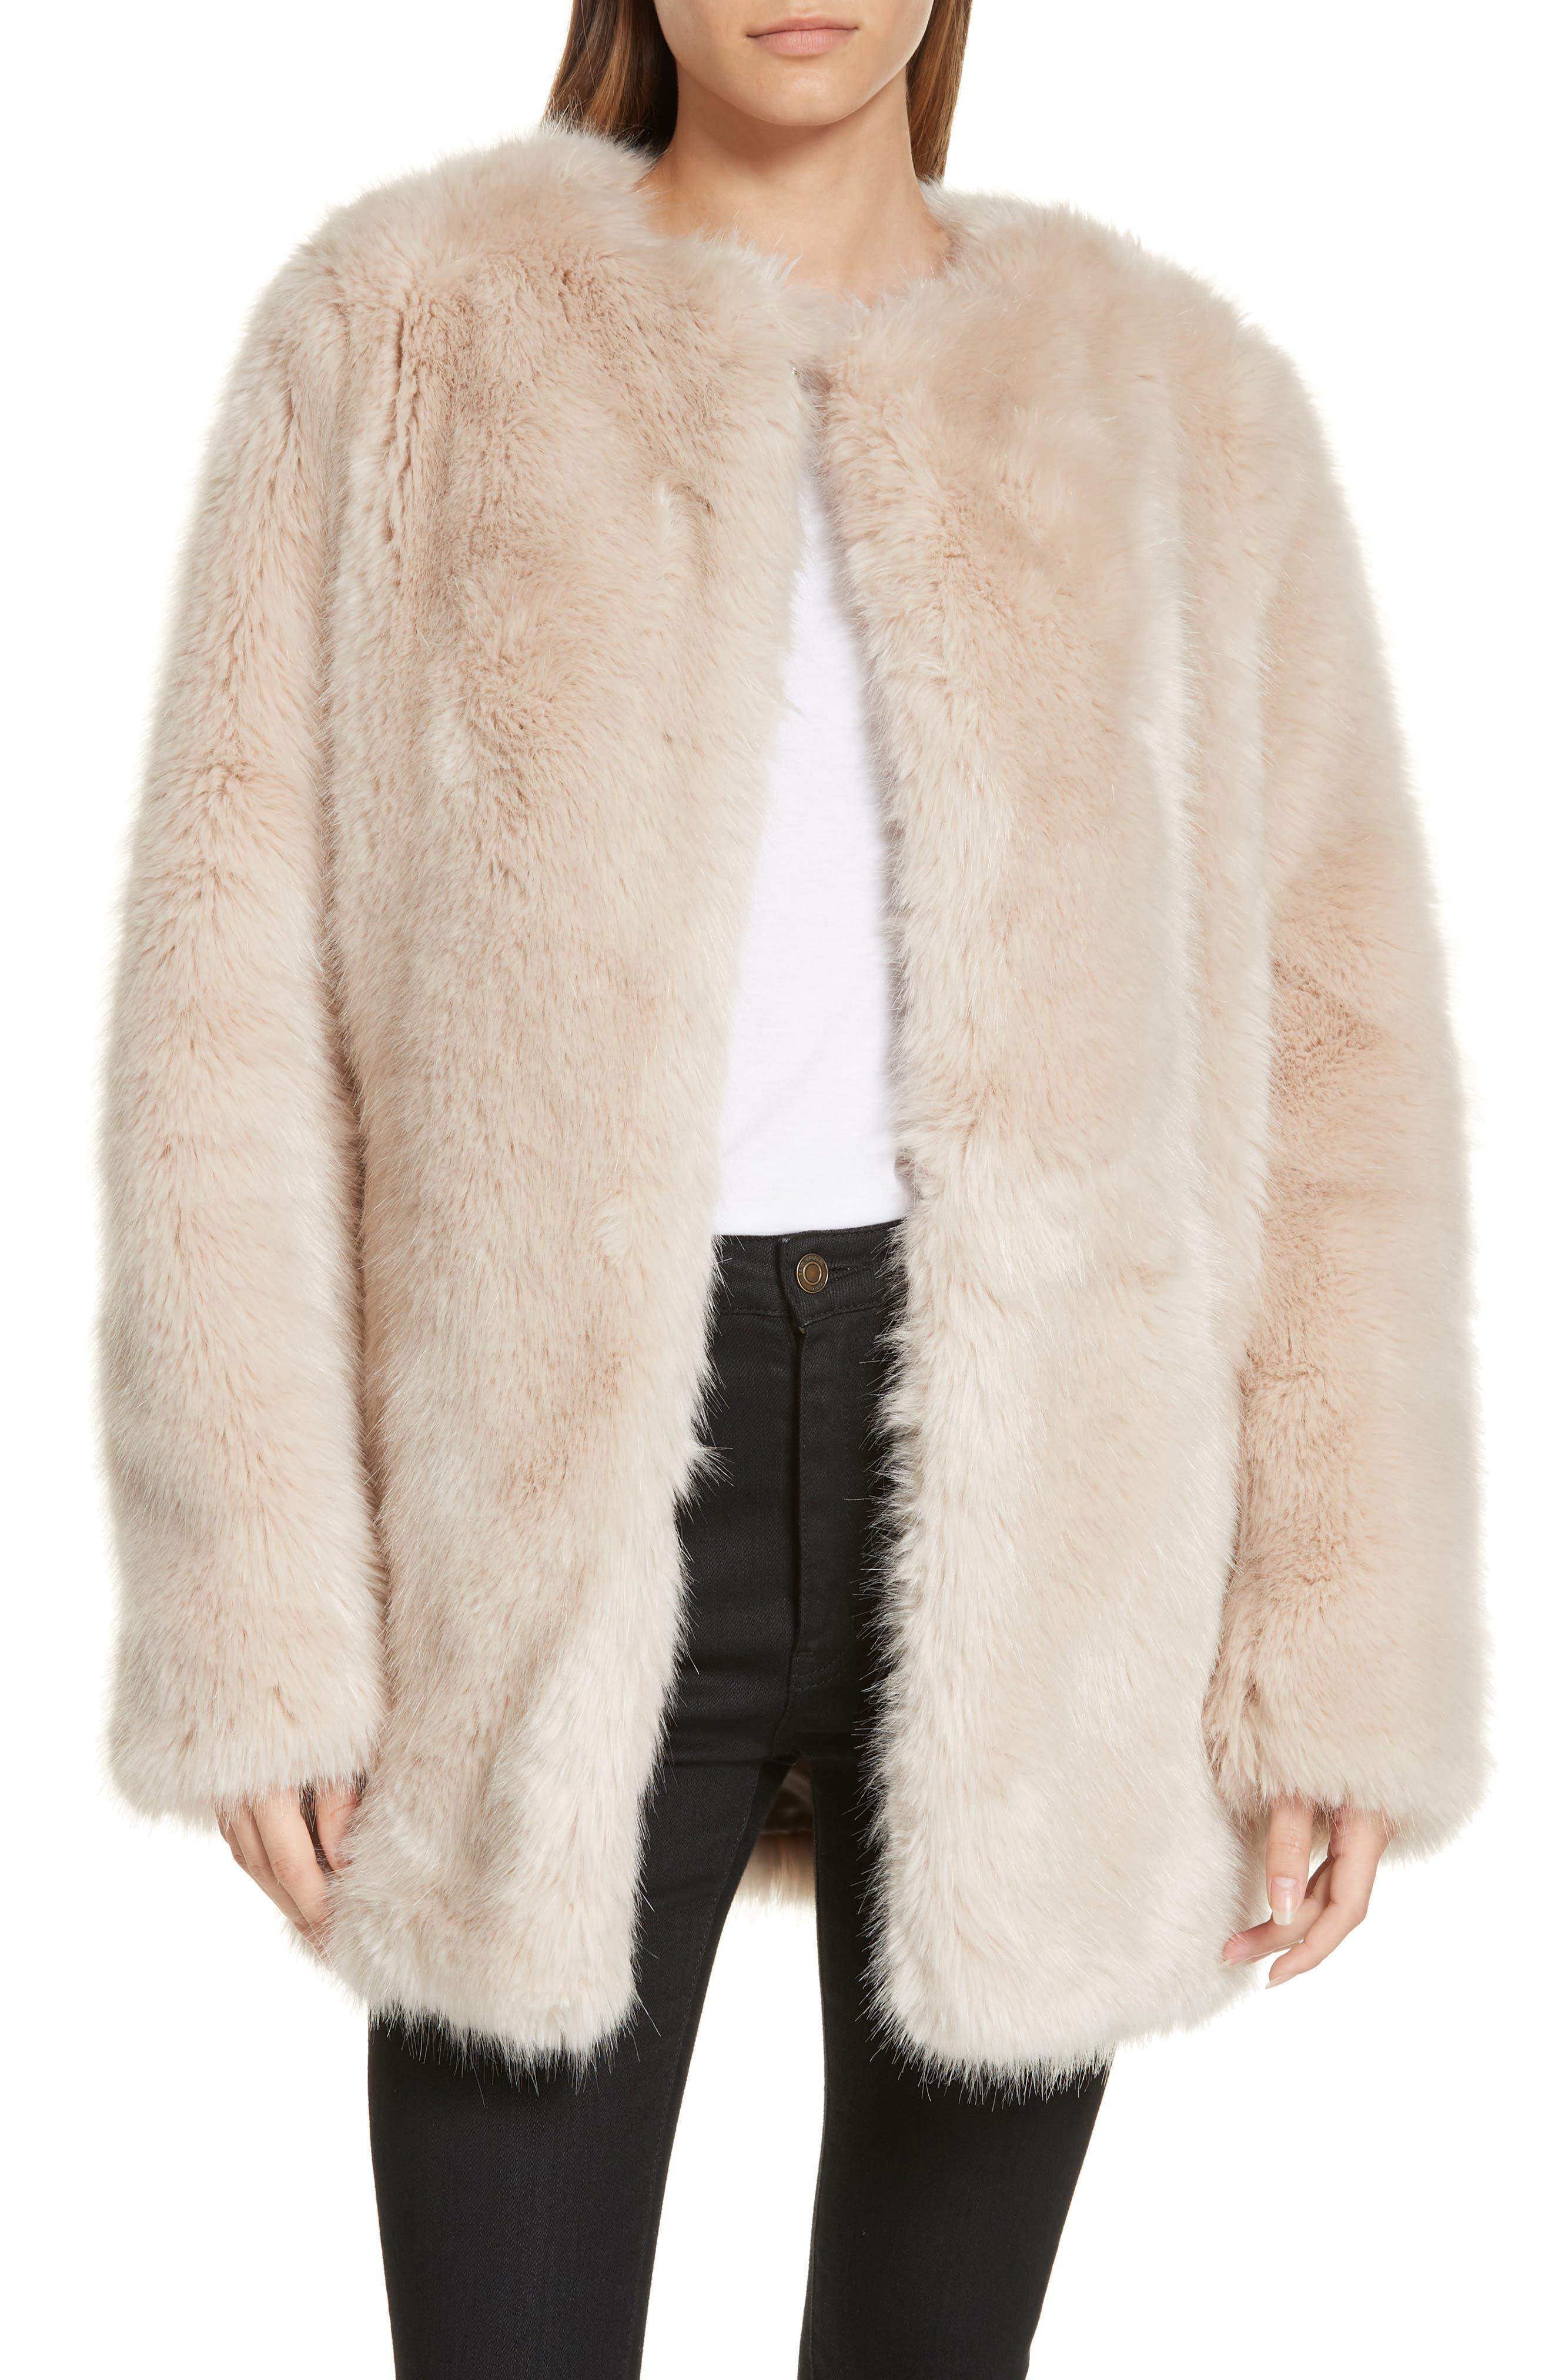 HELMUT LANG, Faux Fur Coat, Main thumbnail 1, color, OATMEAL